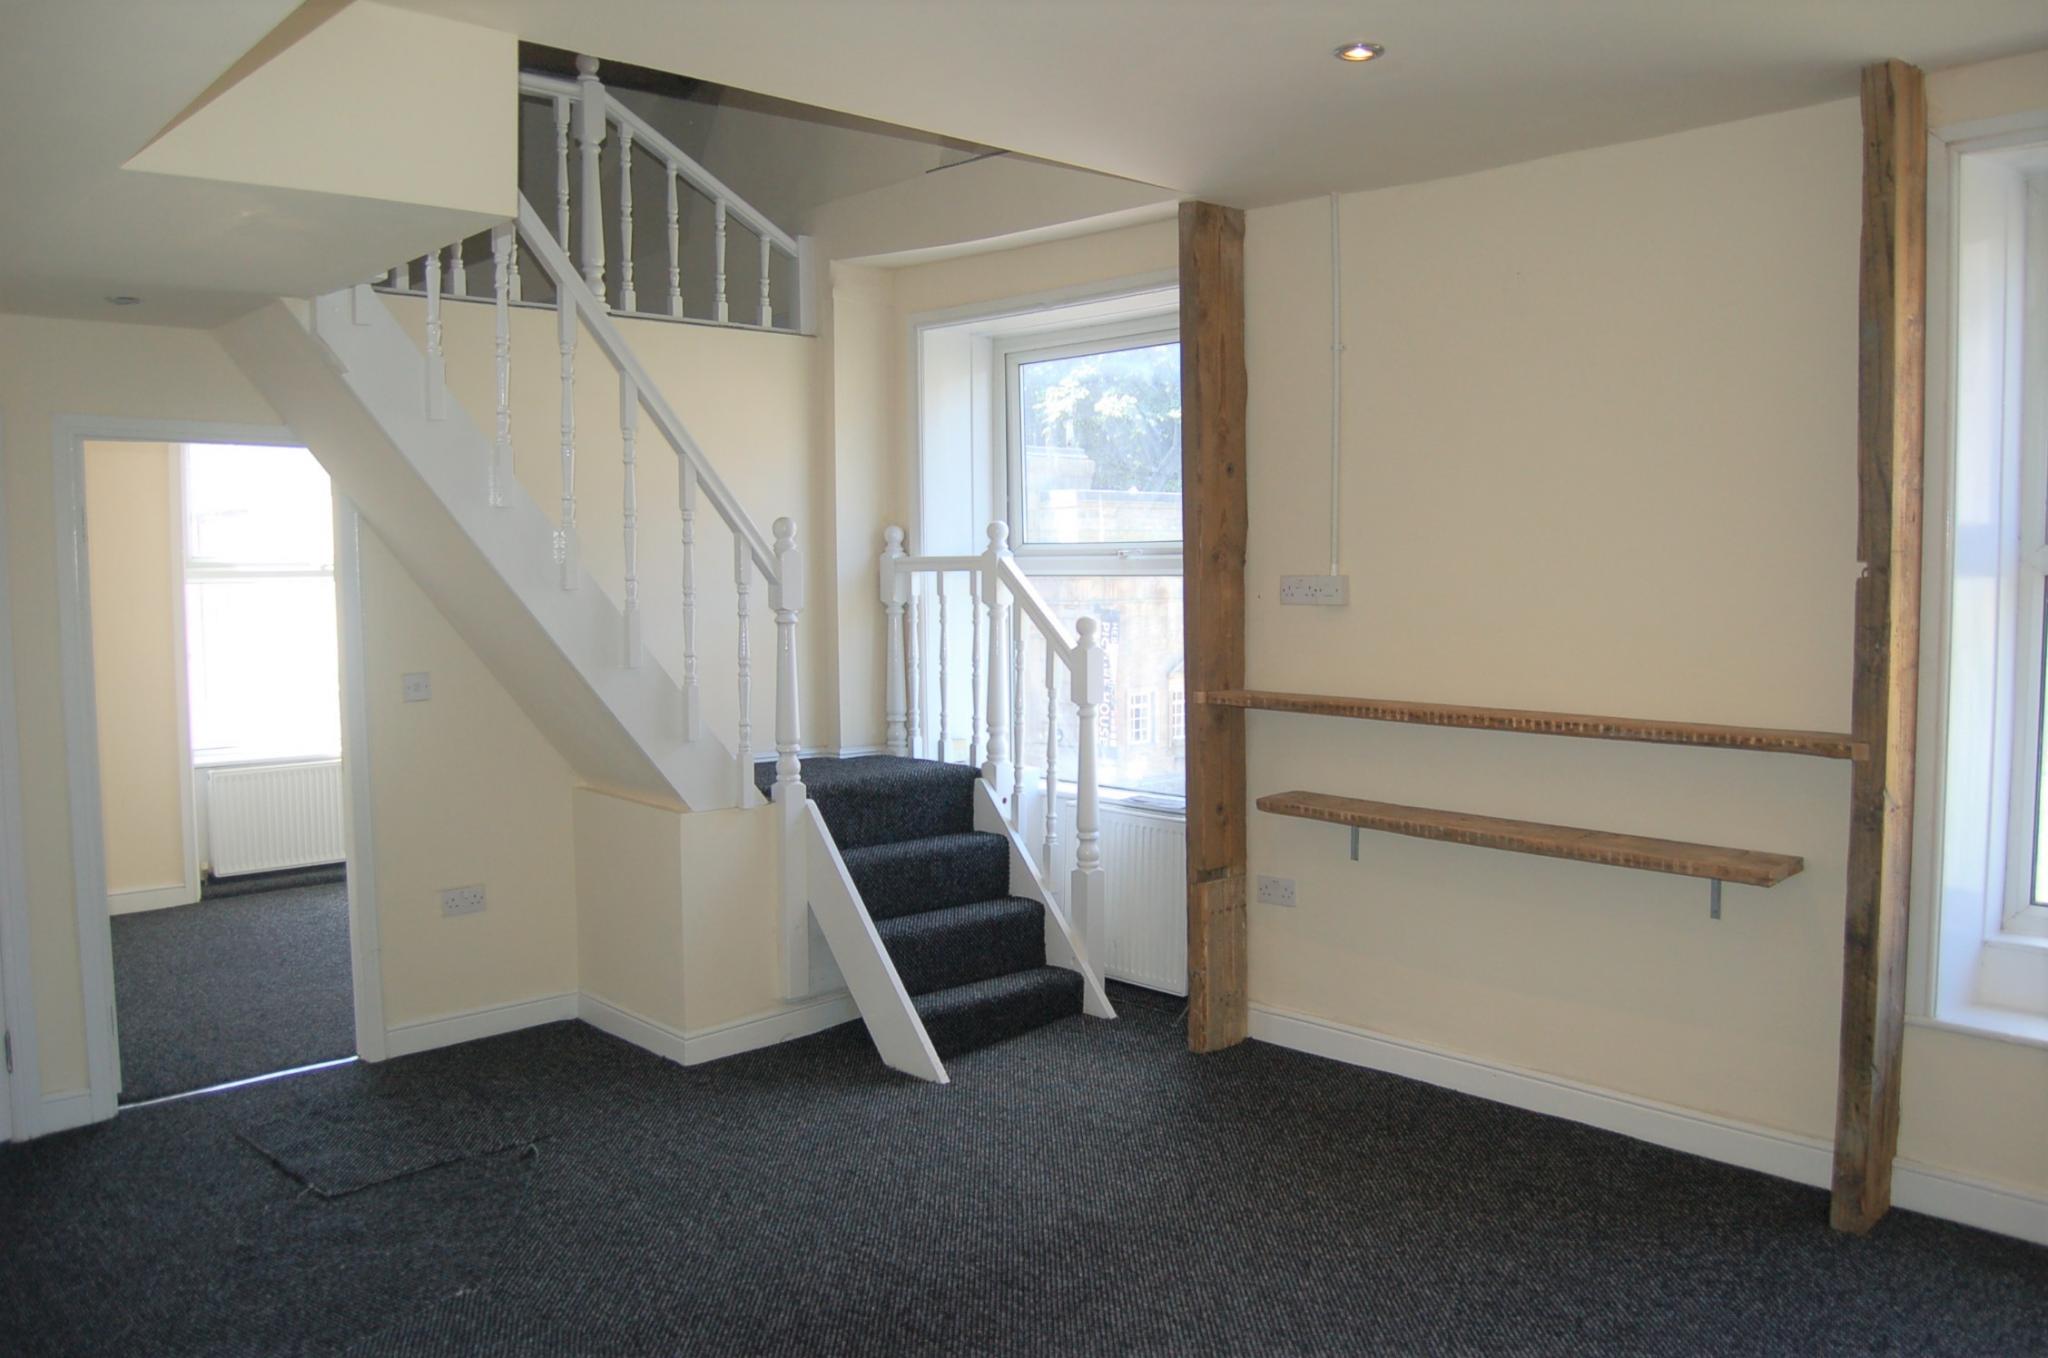 3 bedroom duplex flat/apartment To Let in Hebden Bridge - Property photograph